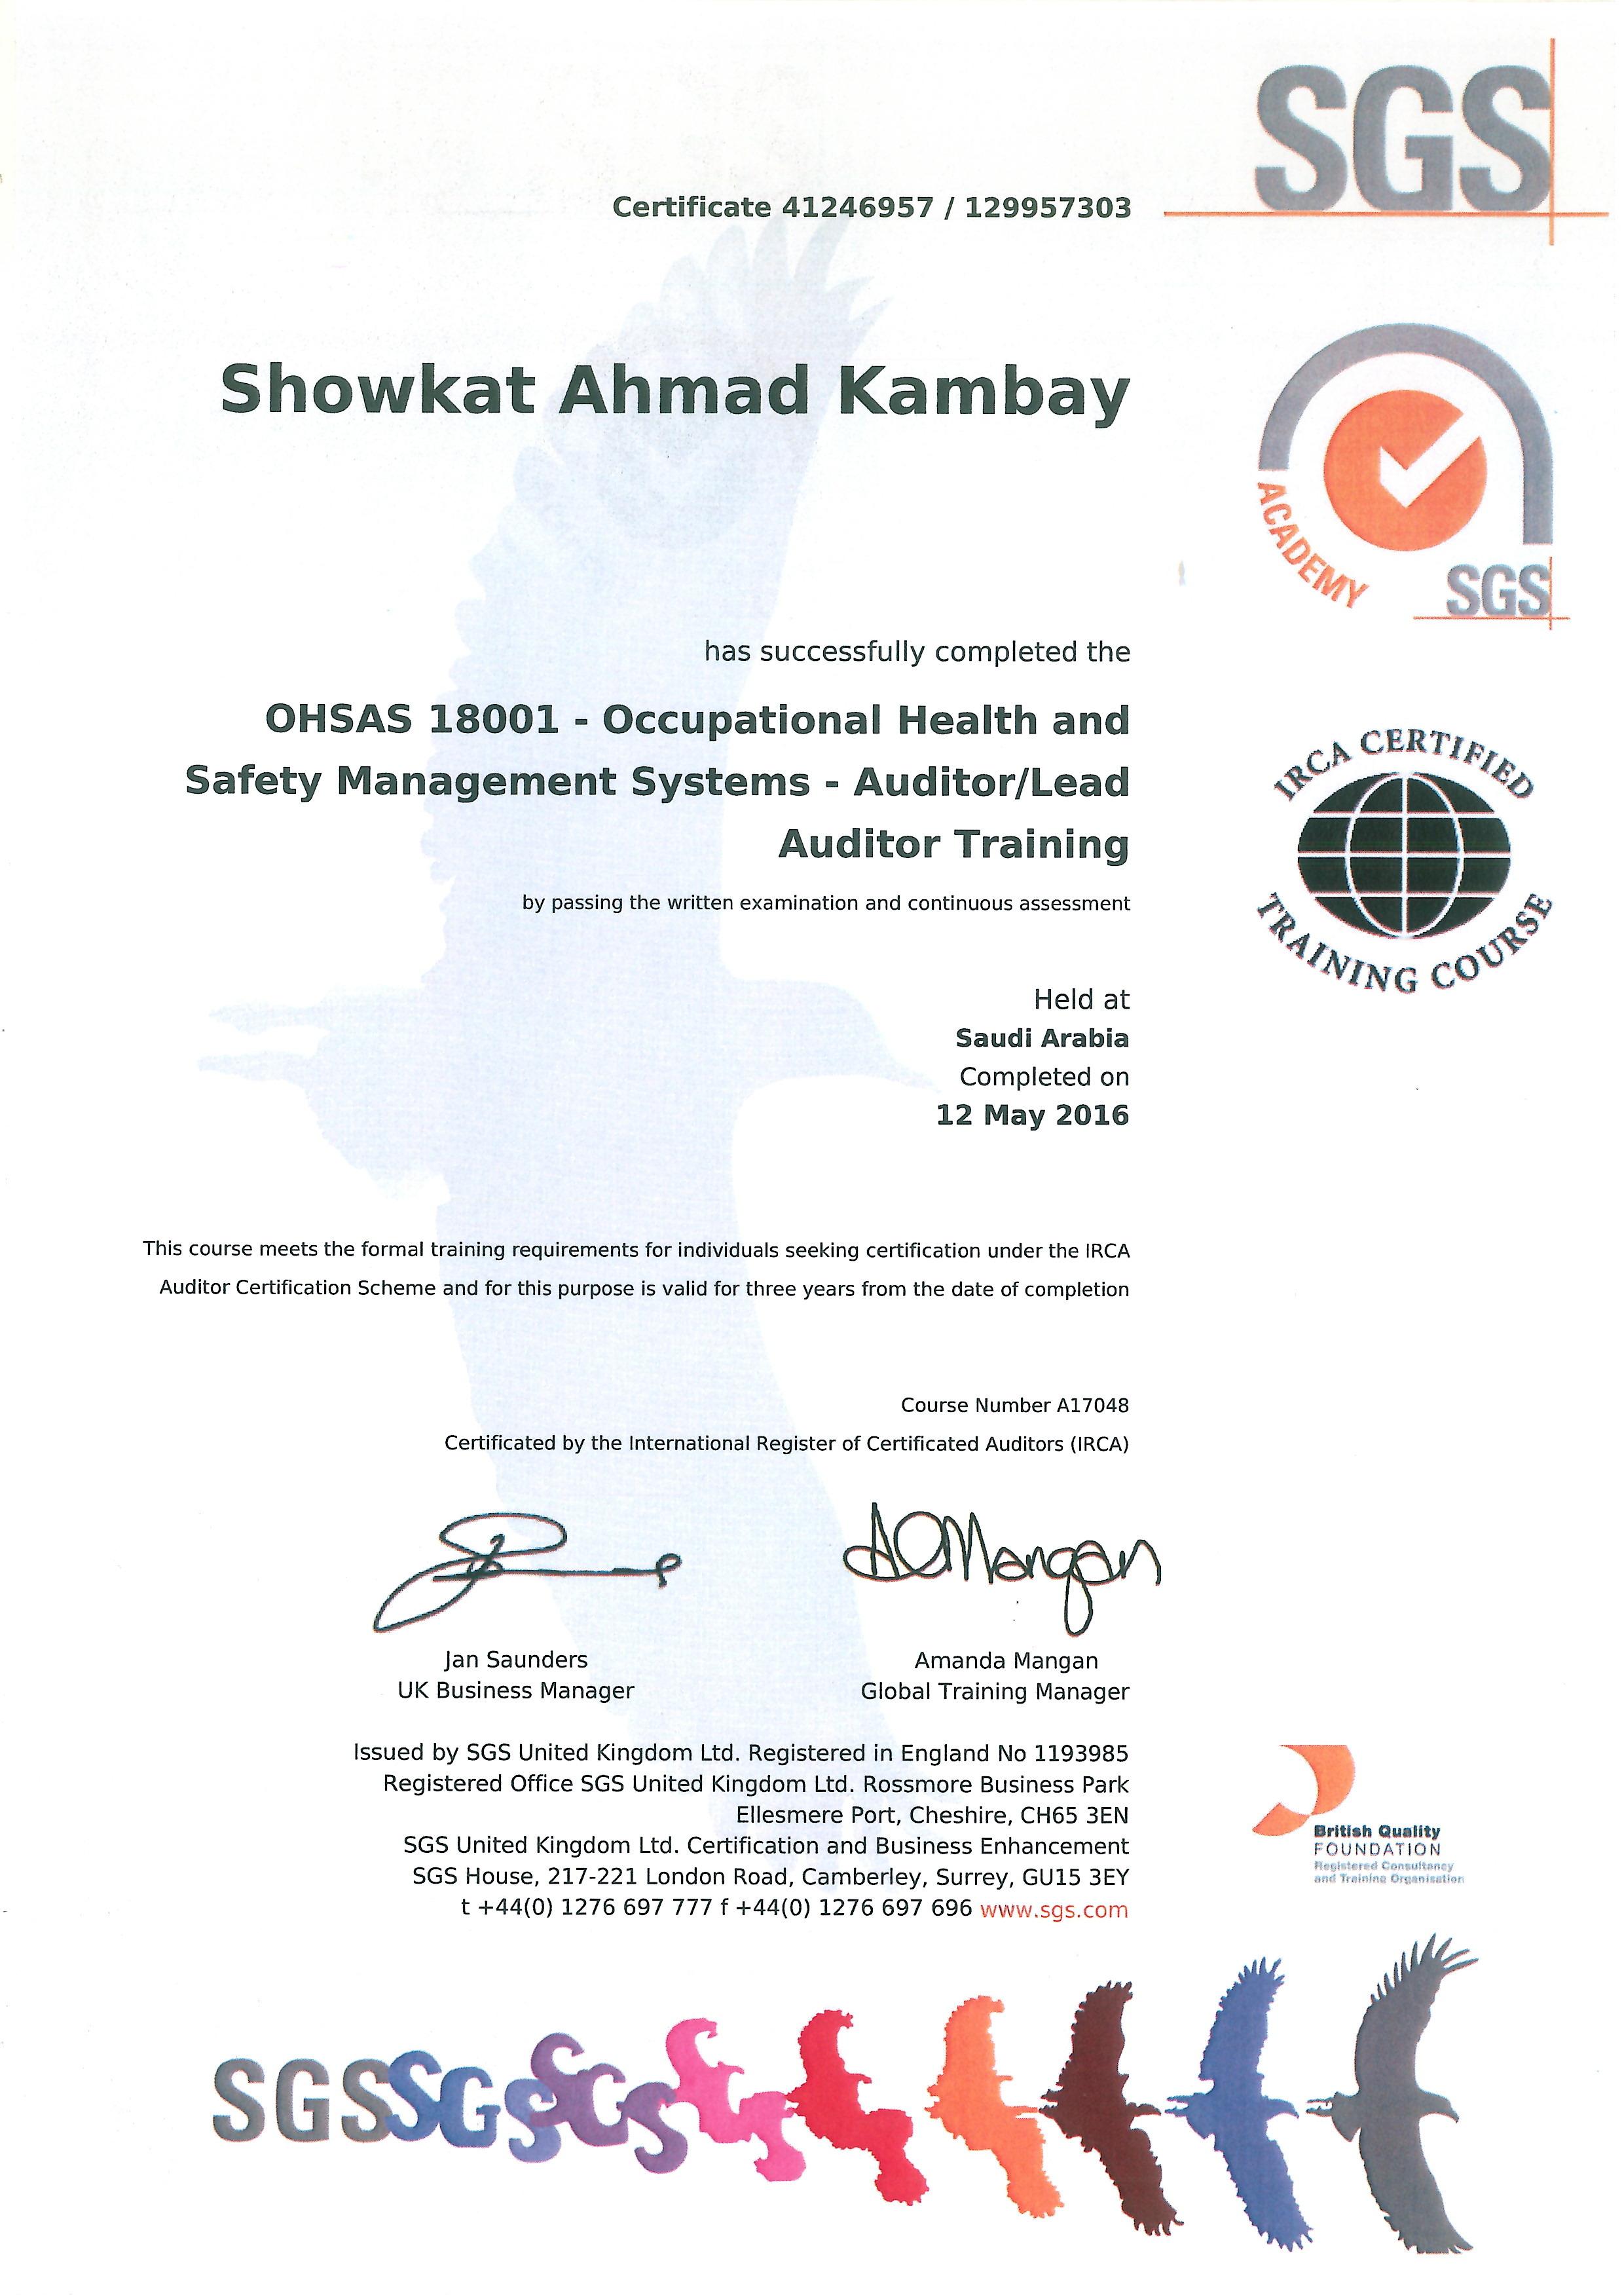 Showka showkat ahmad kambay bayt ohsas lead audit course certificate 1betcityfo Gallery